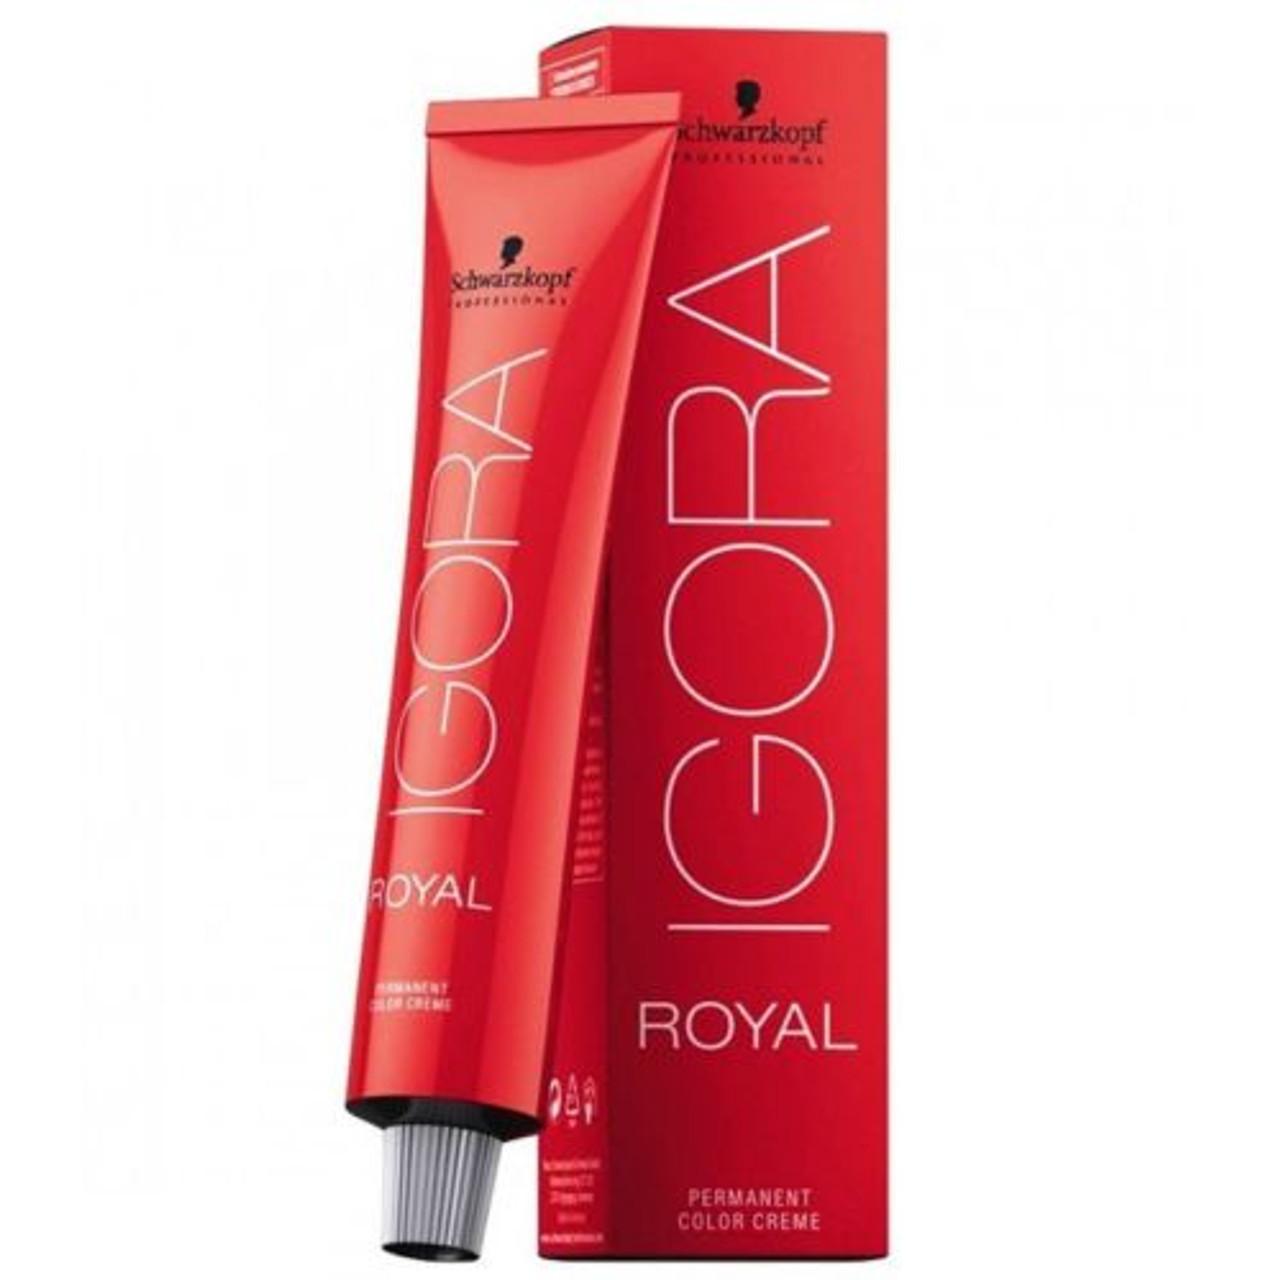 Schwarzkopf Igora Royal Permanent Color Creme - Extra Light blonde 9-0